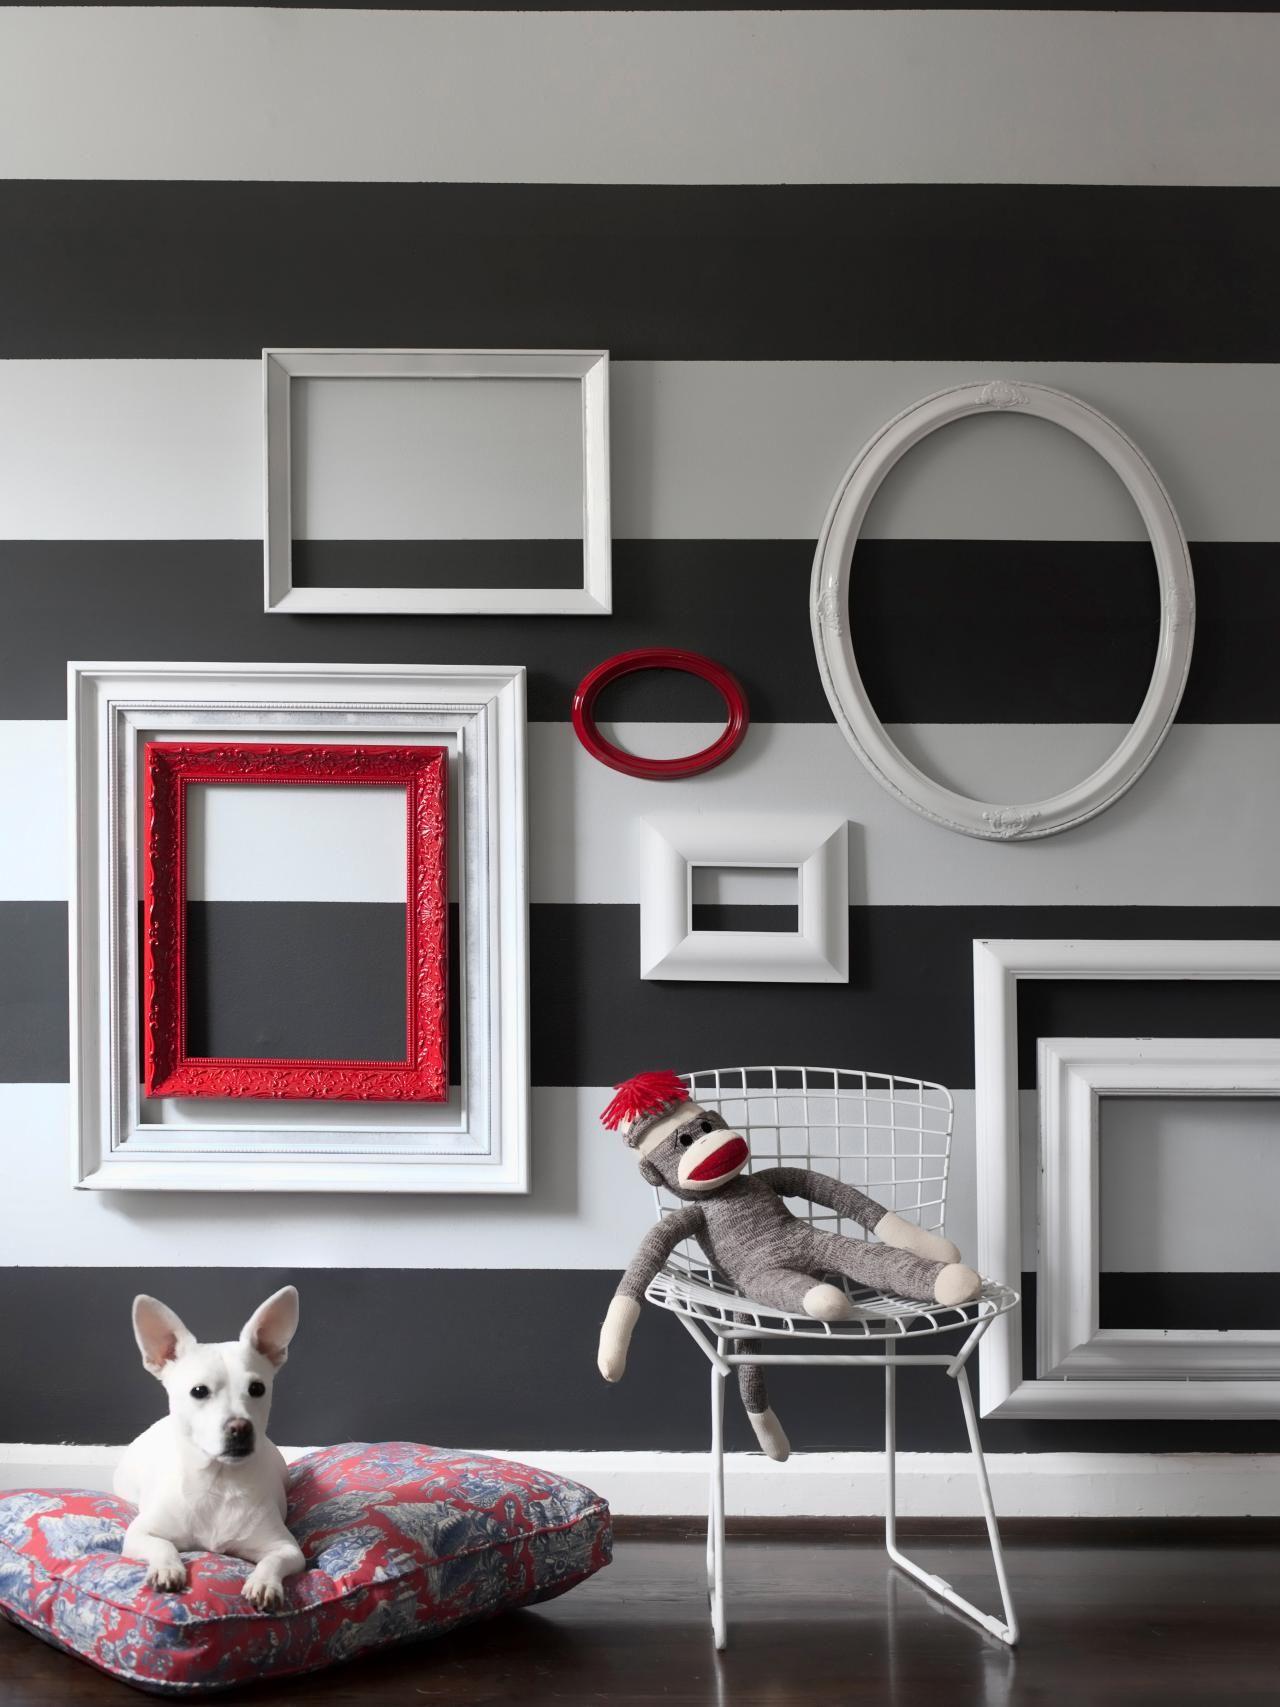 25 Ways To Dress Up Blank Walls